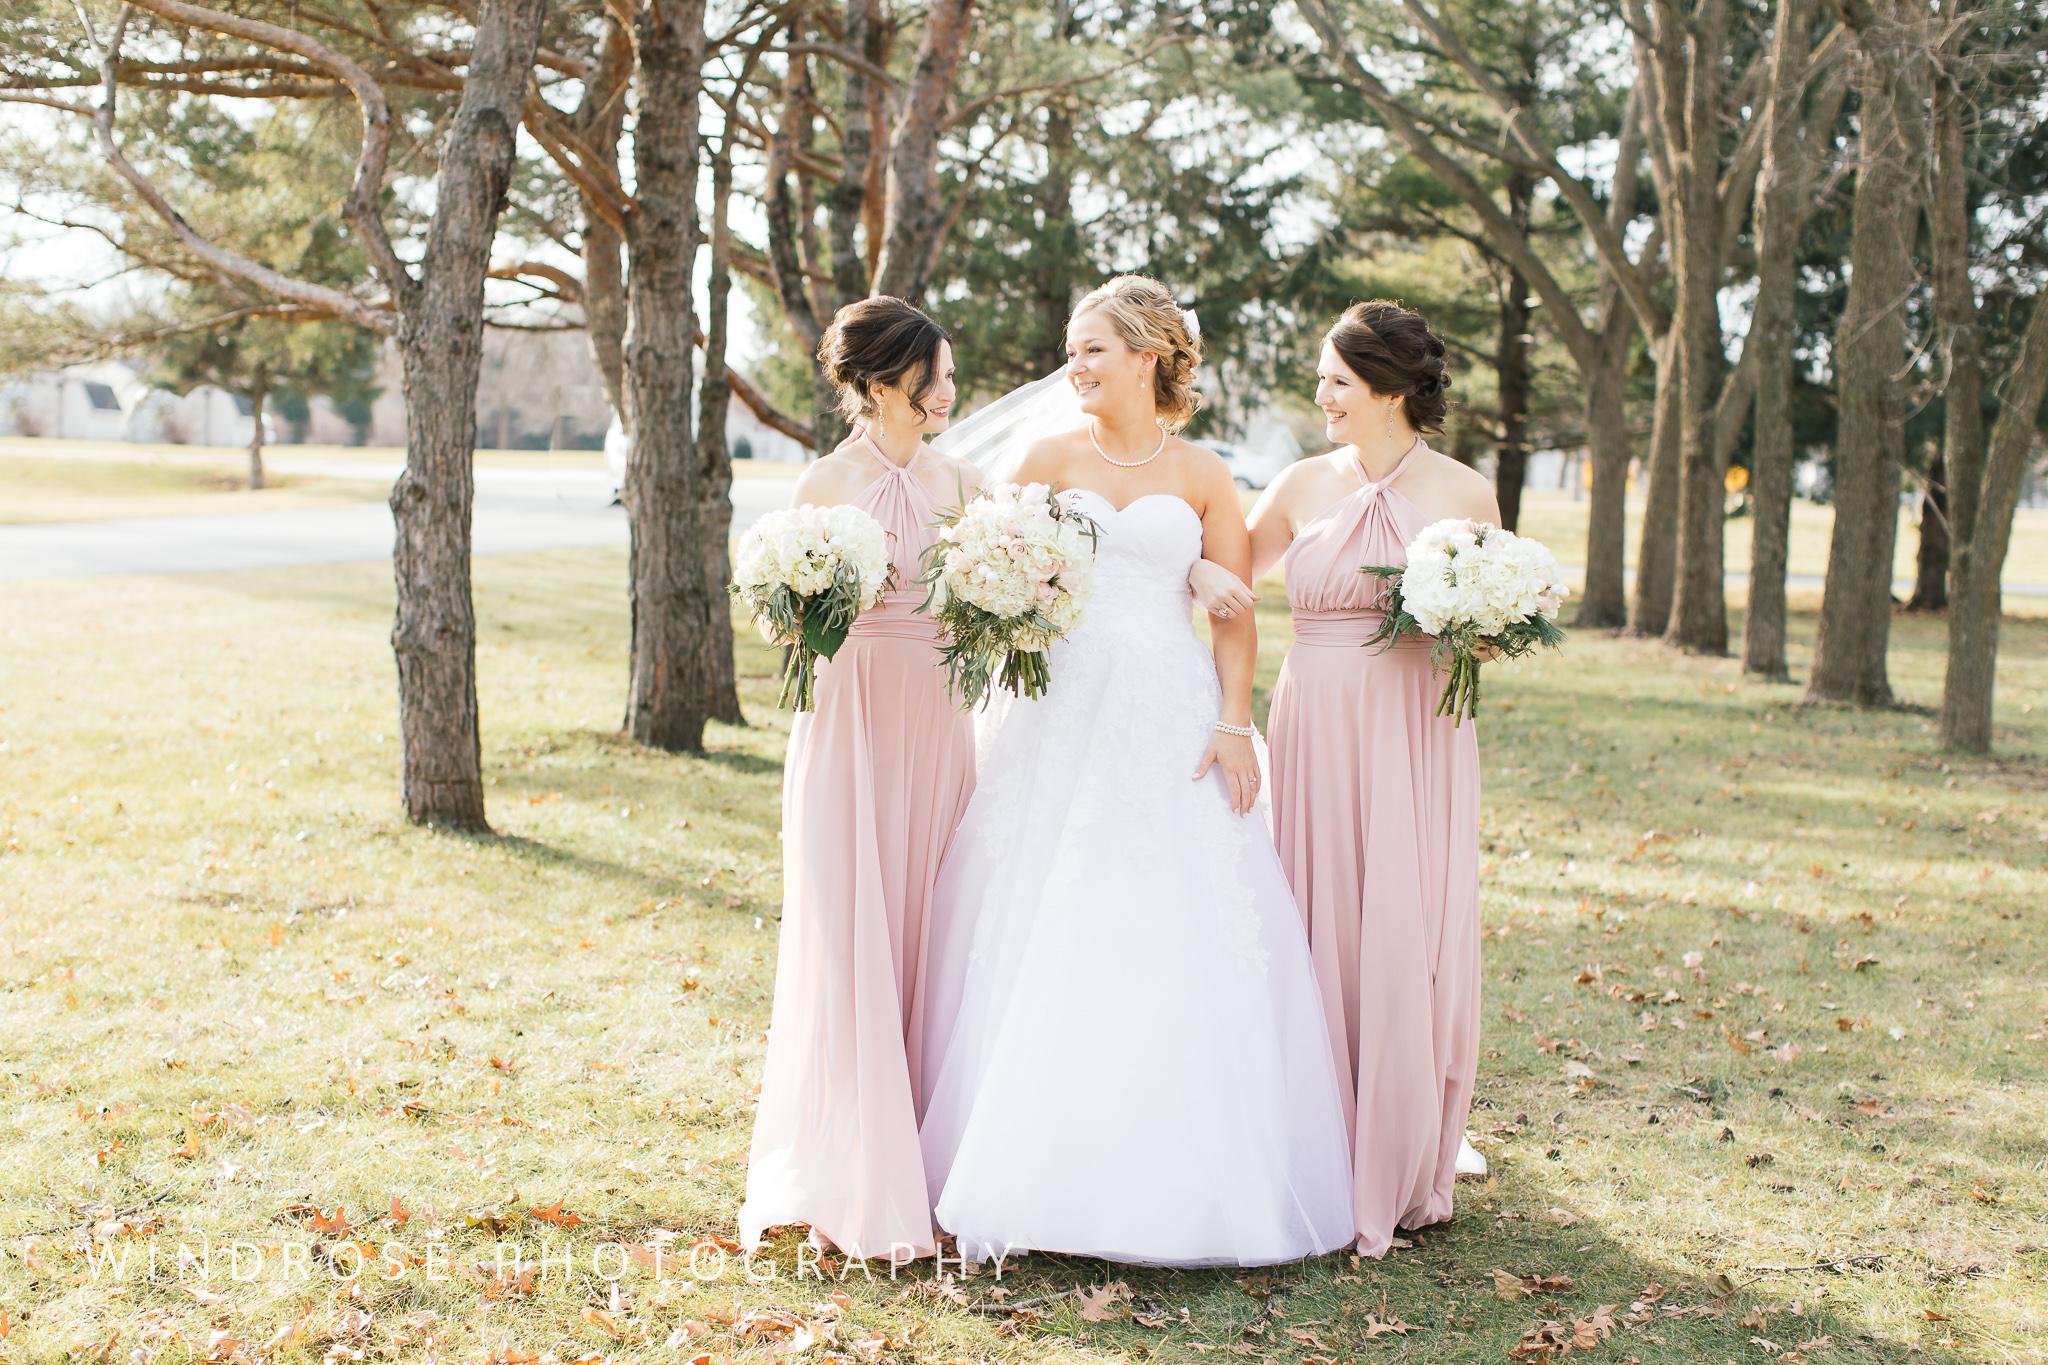 Rochester-MN-Wedding-Photo-19.jpg